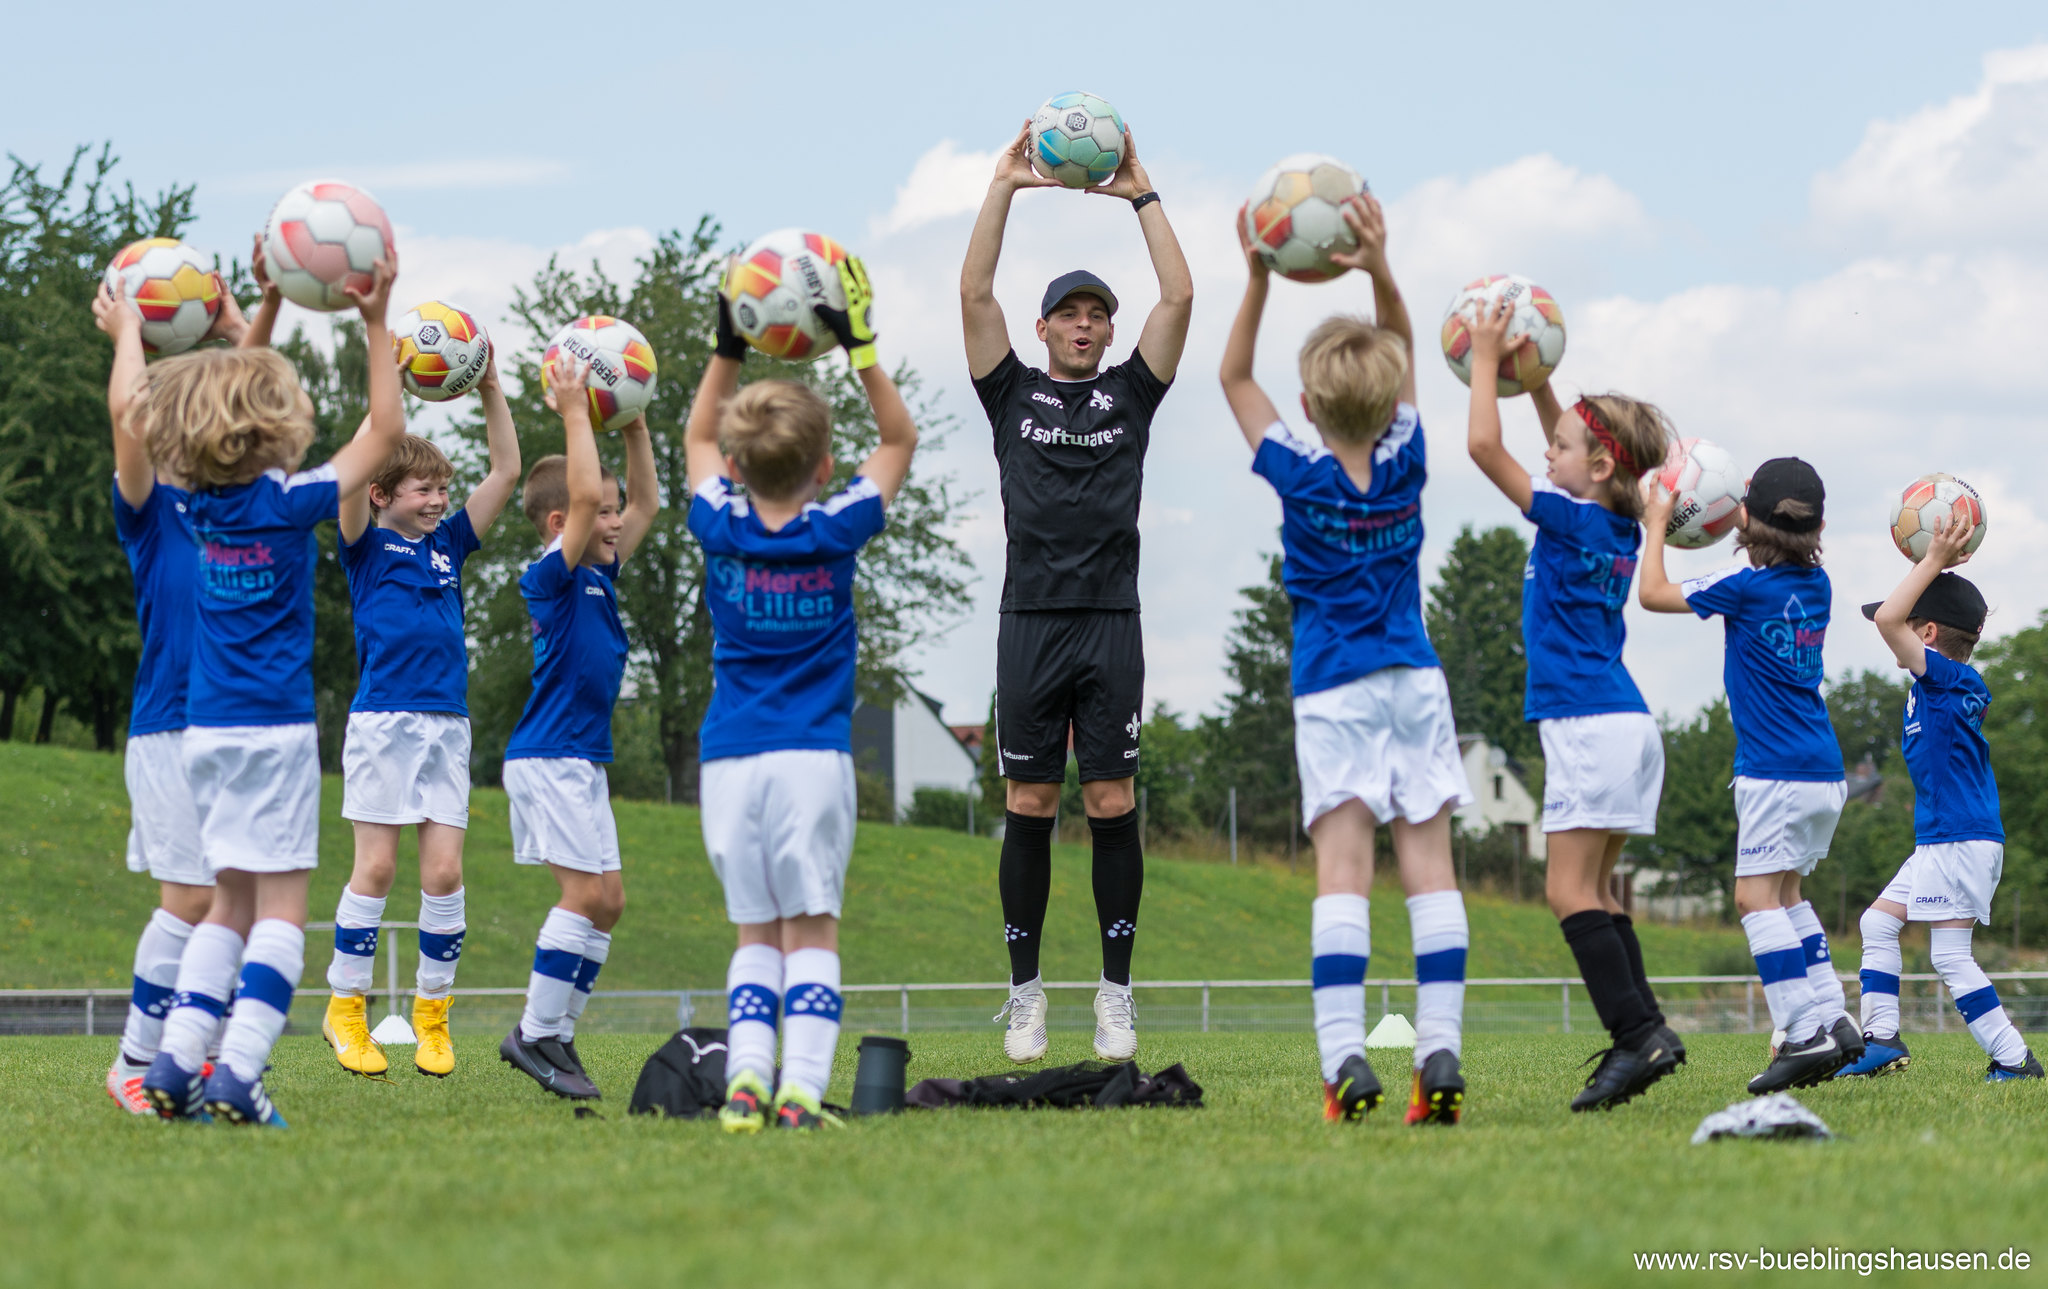 You are currently viewing Lilien-Fußball-Camp beim RSV: Noch freie Plätze!